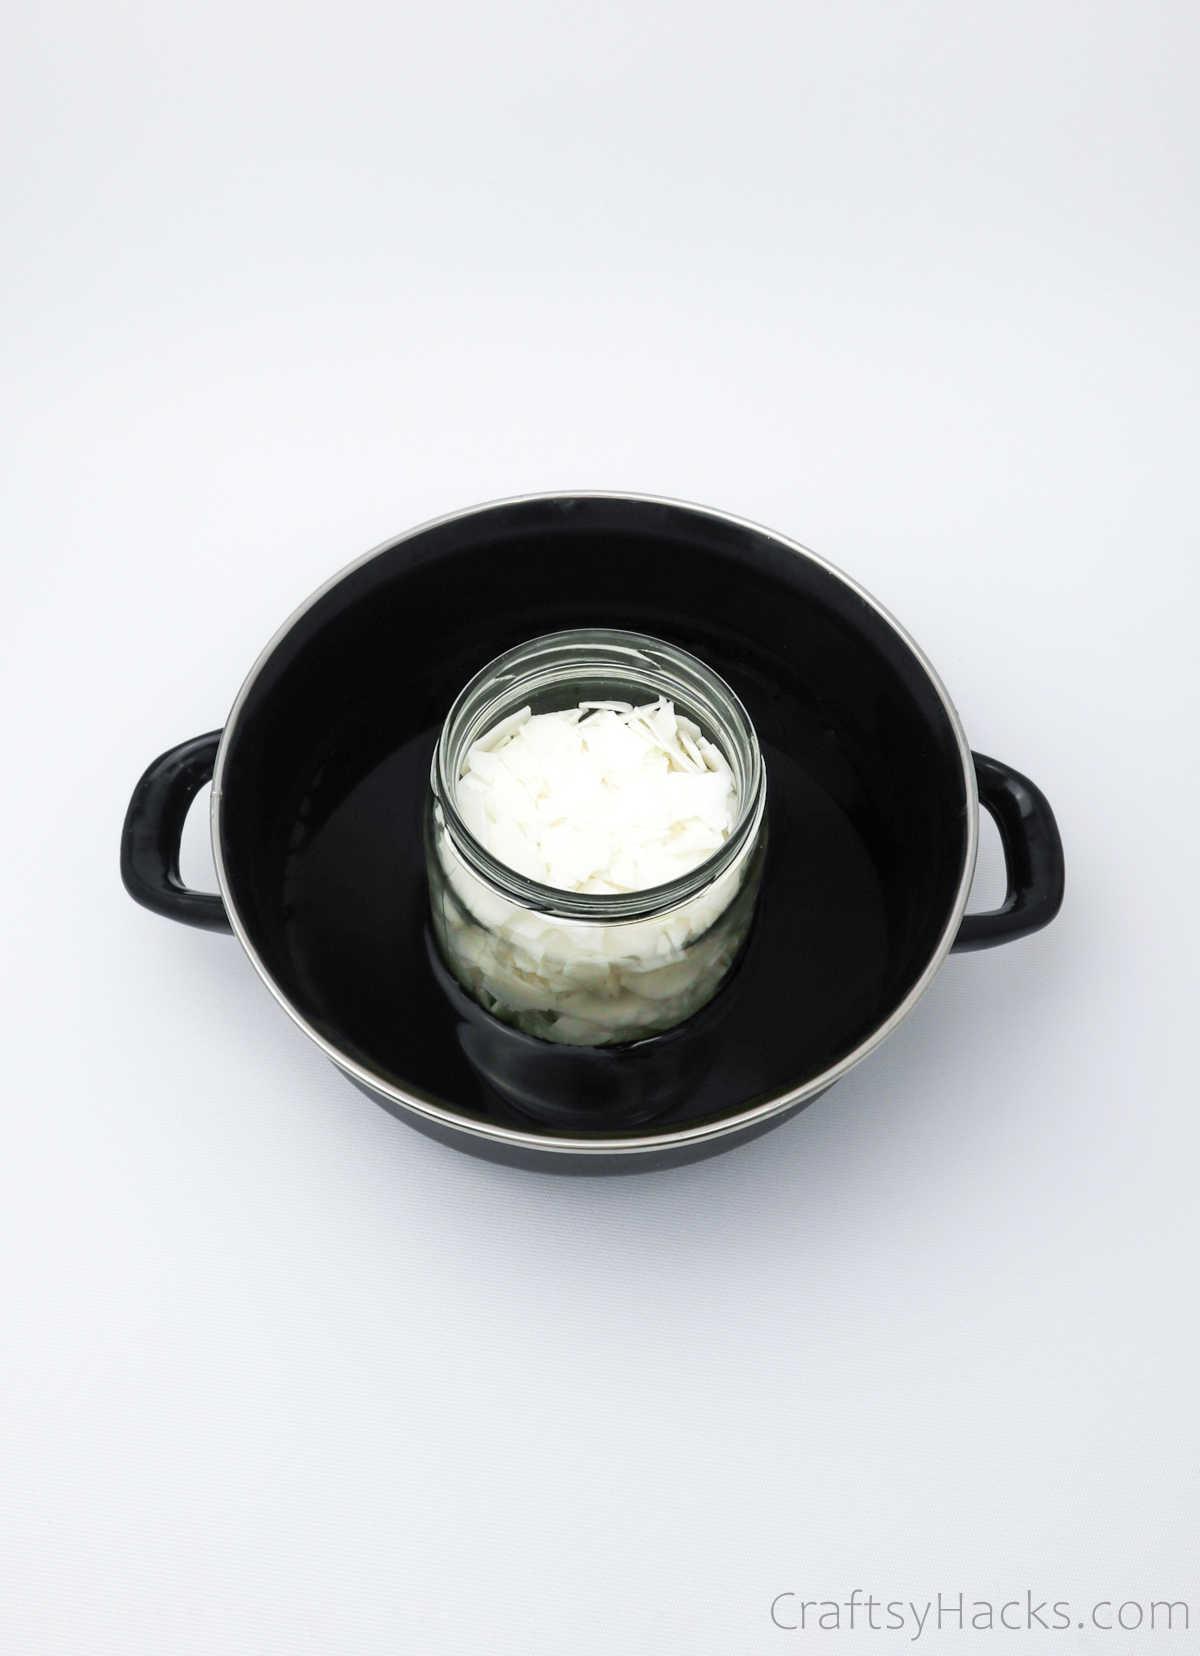 melting wax in jar